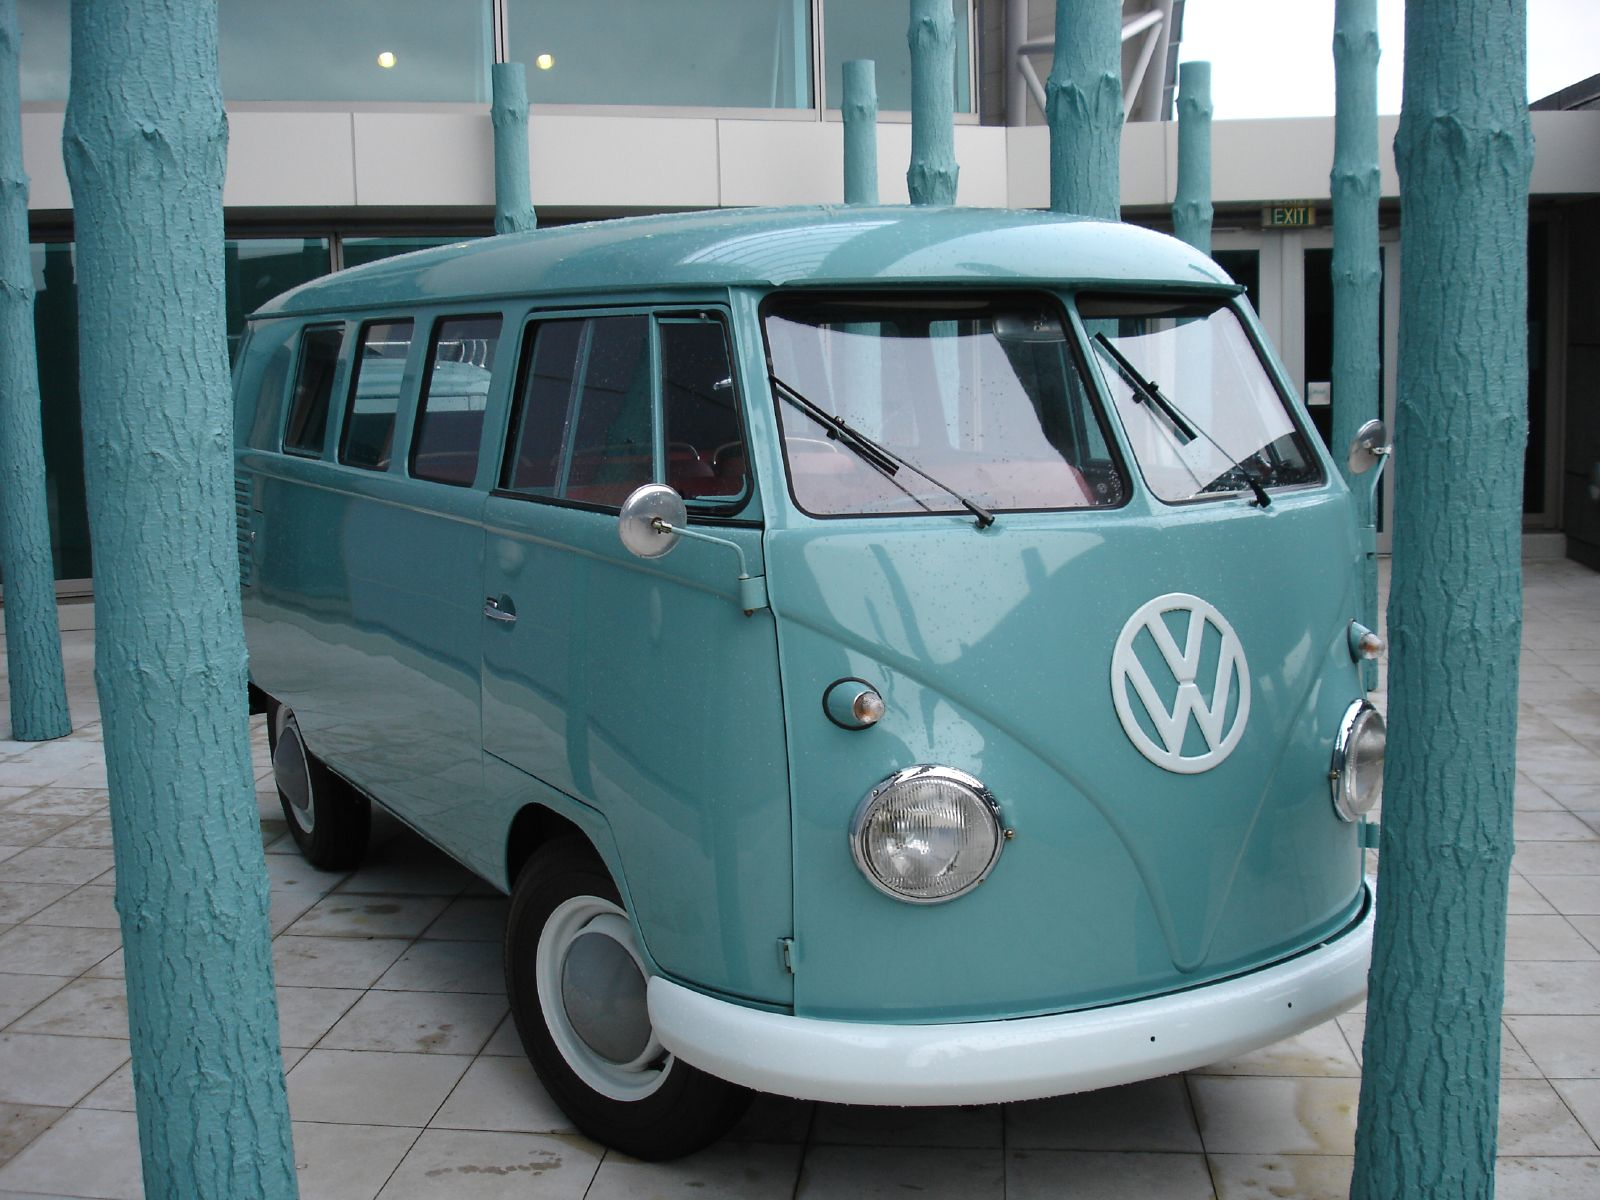 volkswagen bus related images start 100 weili automotive network. Black Bedroom Furniture Sets. Home Design Ideas